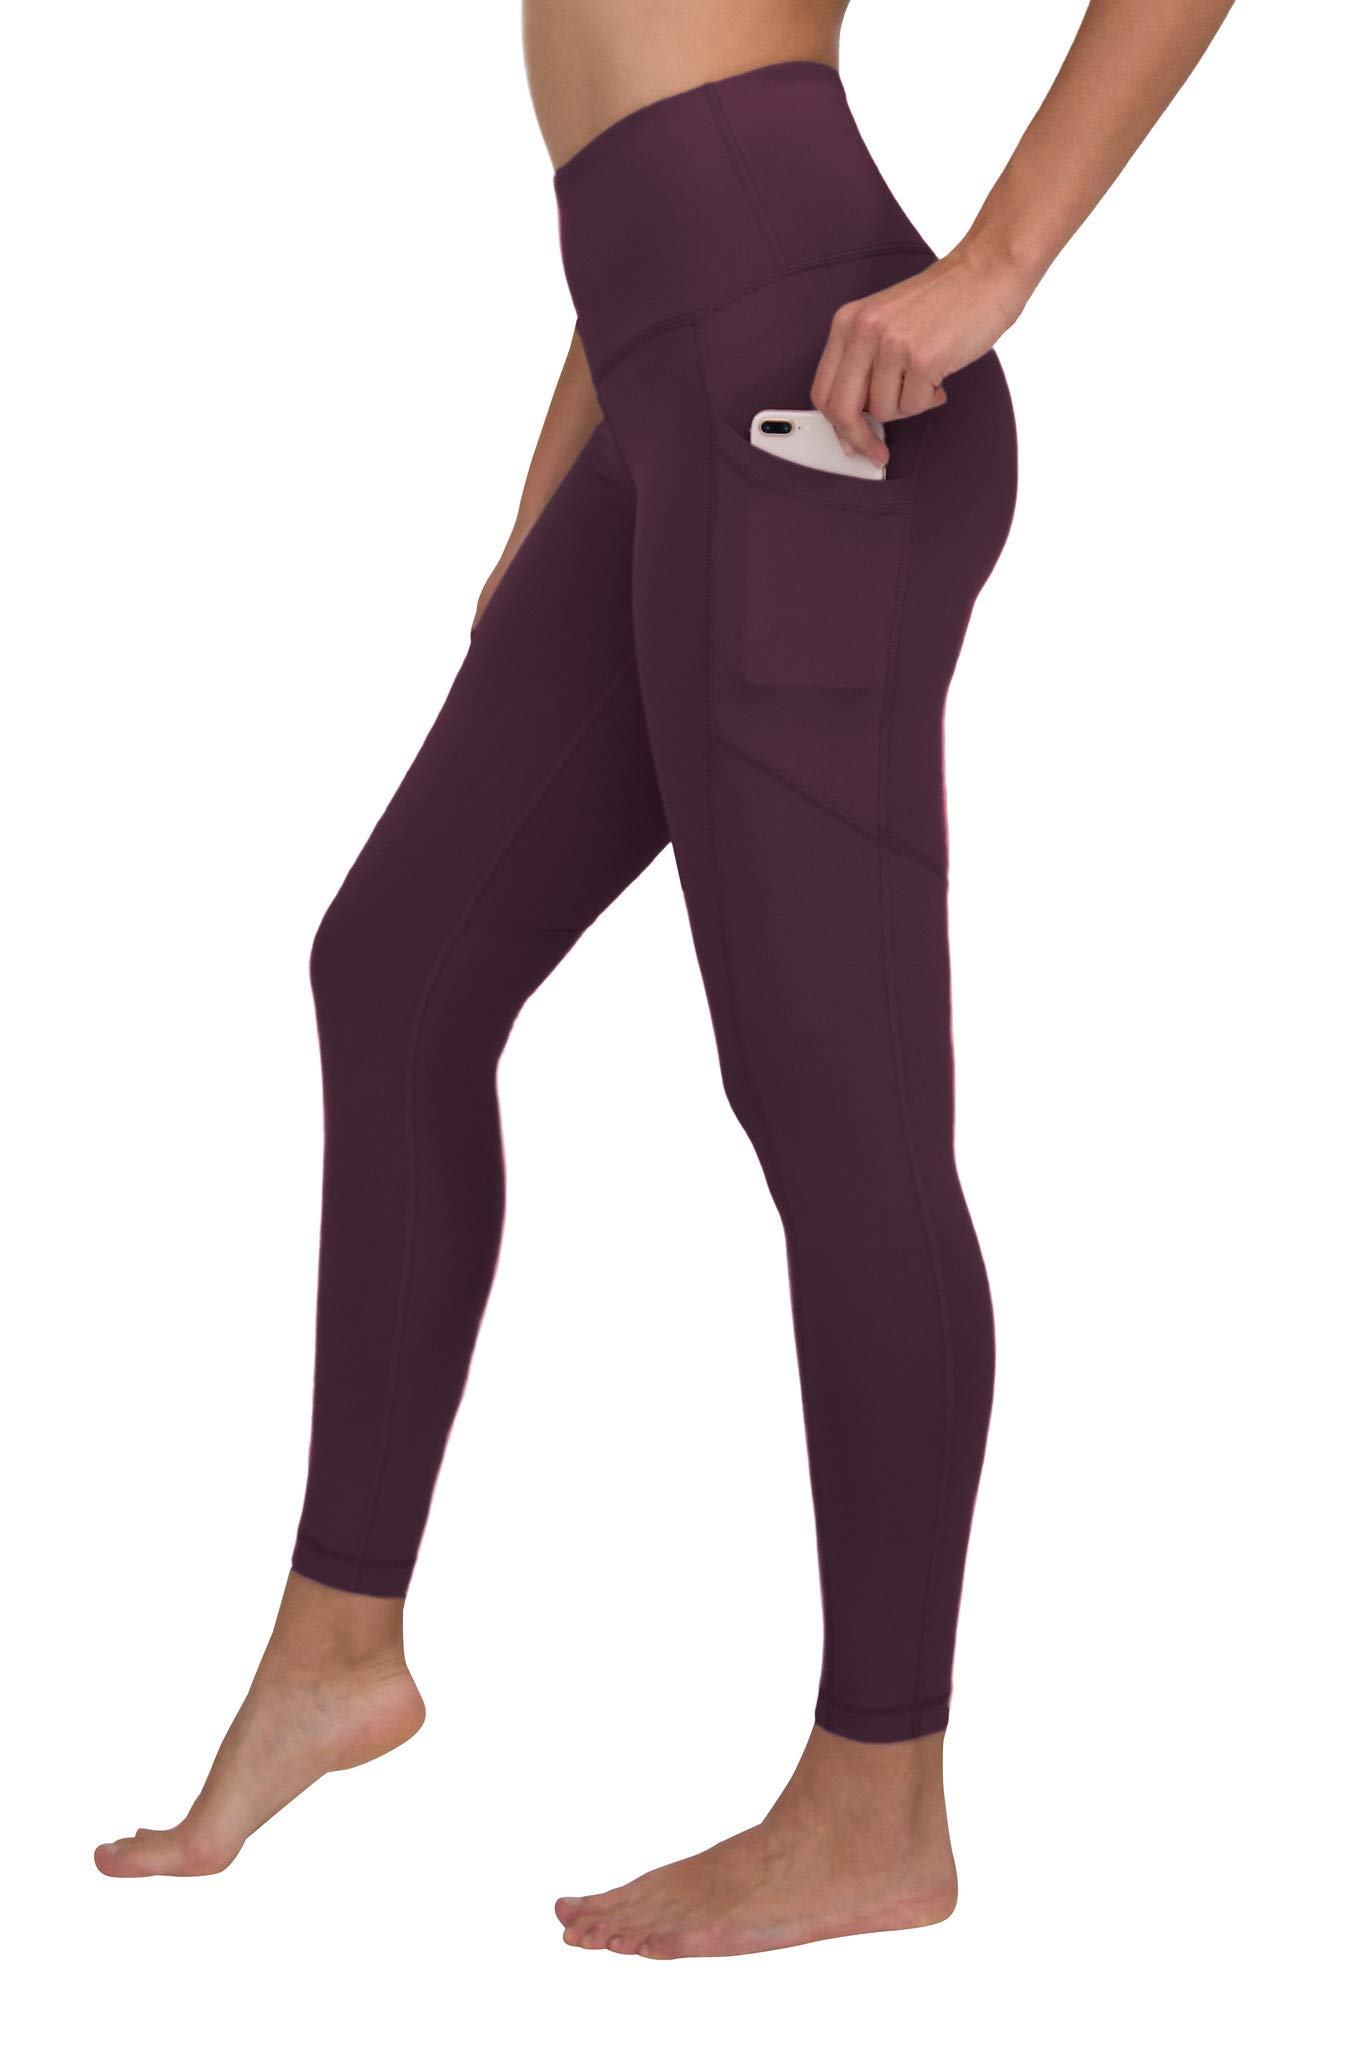 90 Degree By Reflex Women's Power Flex Yoga Pants - Plum Affair - Medium by 90 Degree By Reflex